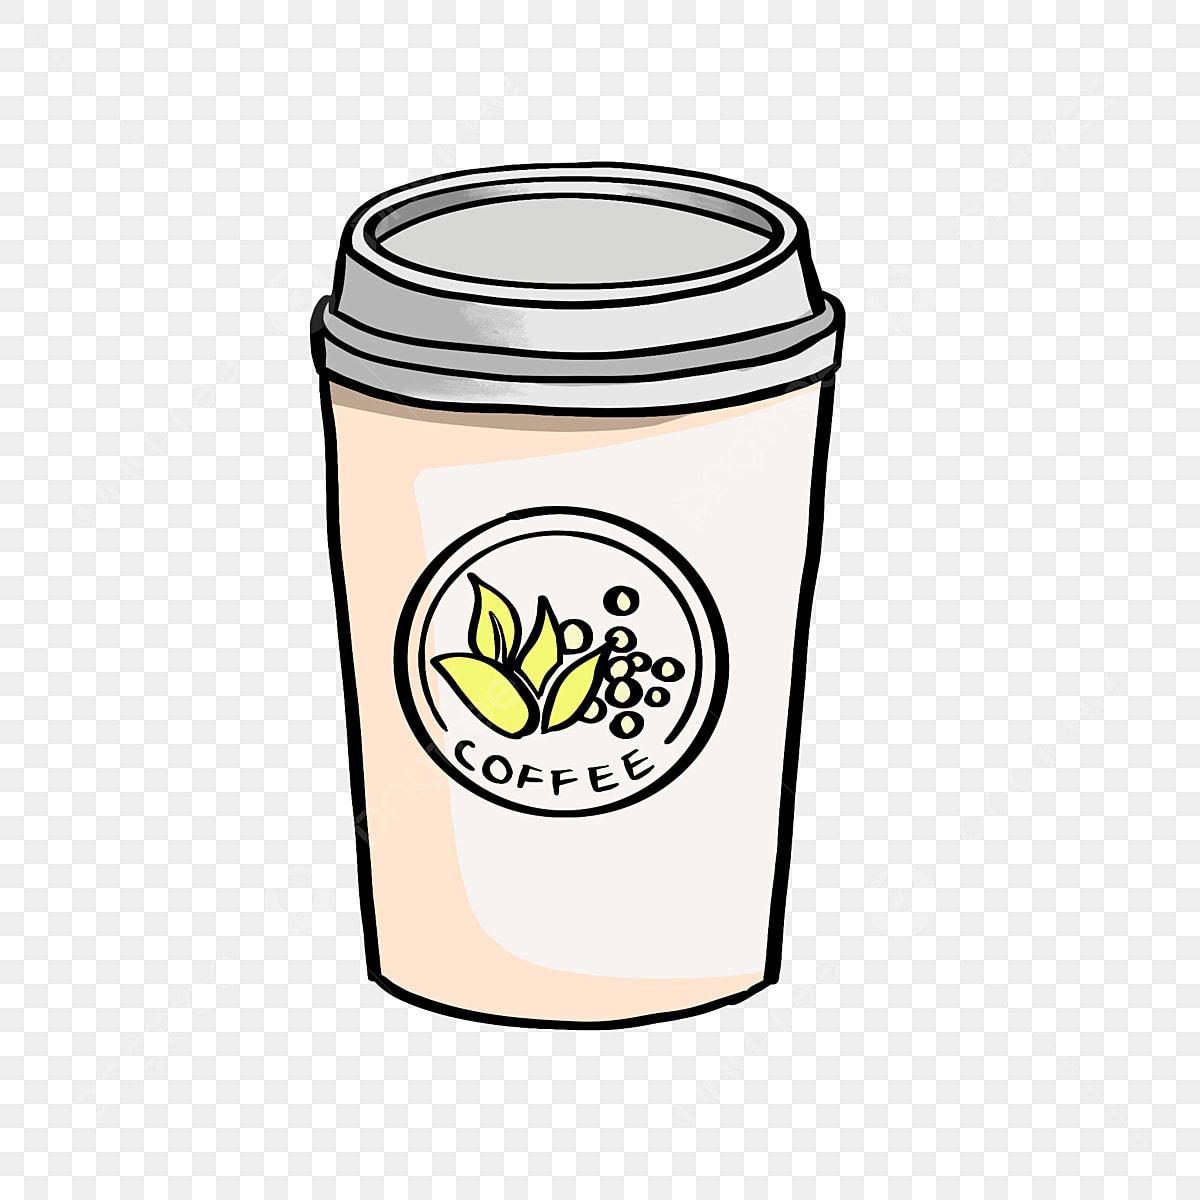 Coffee Shop Coffee Cup Free Buckle Coffee Shop Starbucks